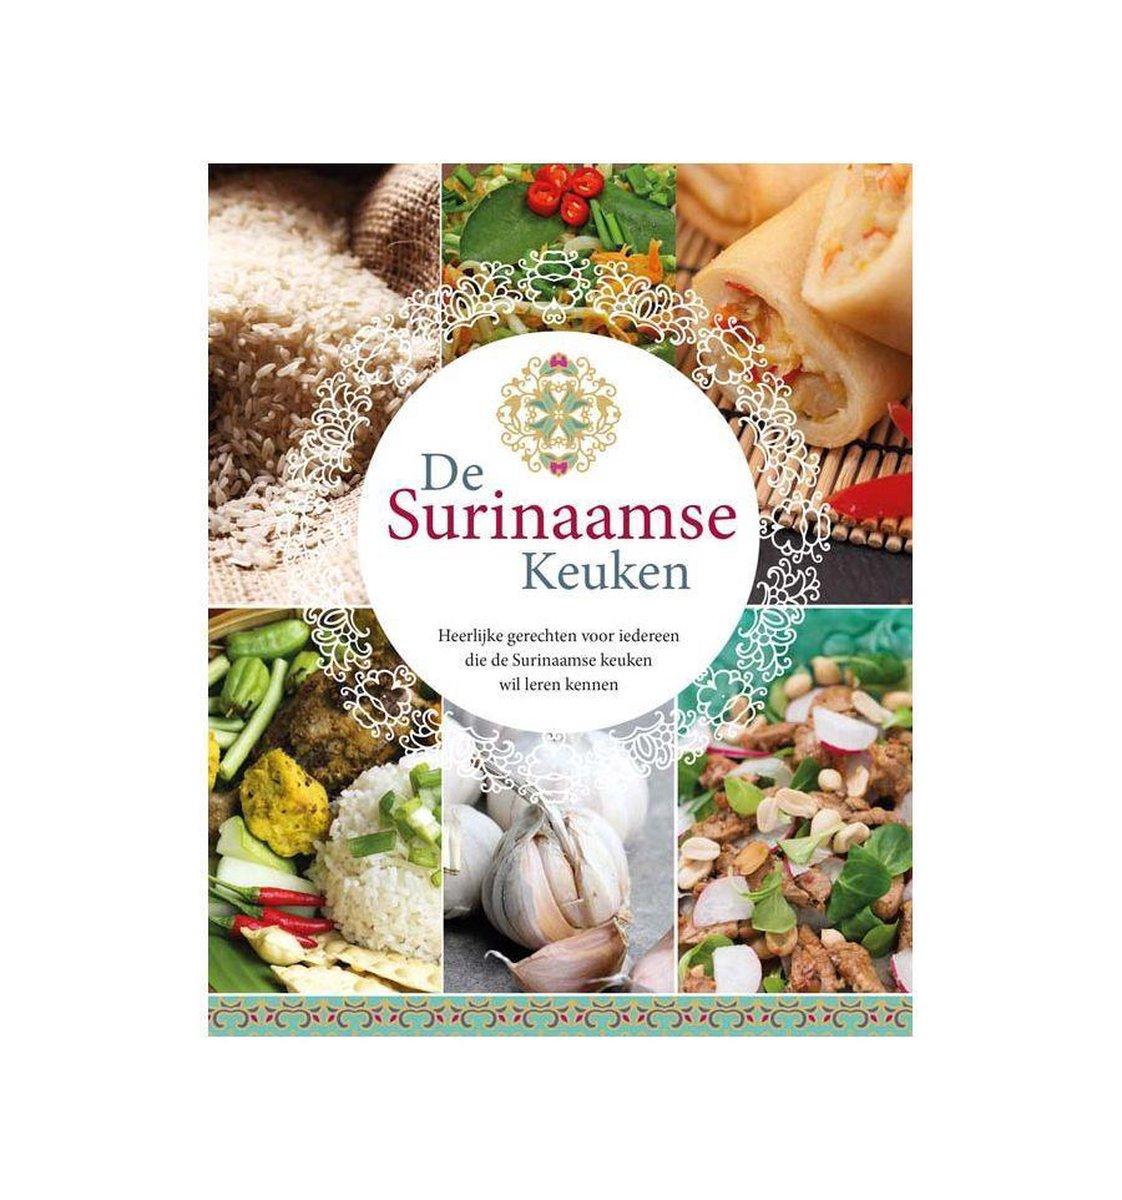 De Surinaamse keuken - Ciska Cress